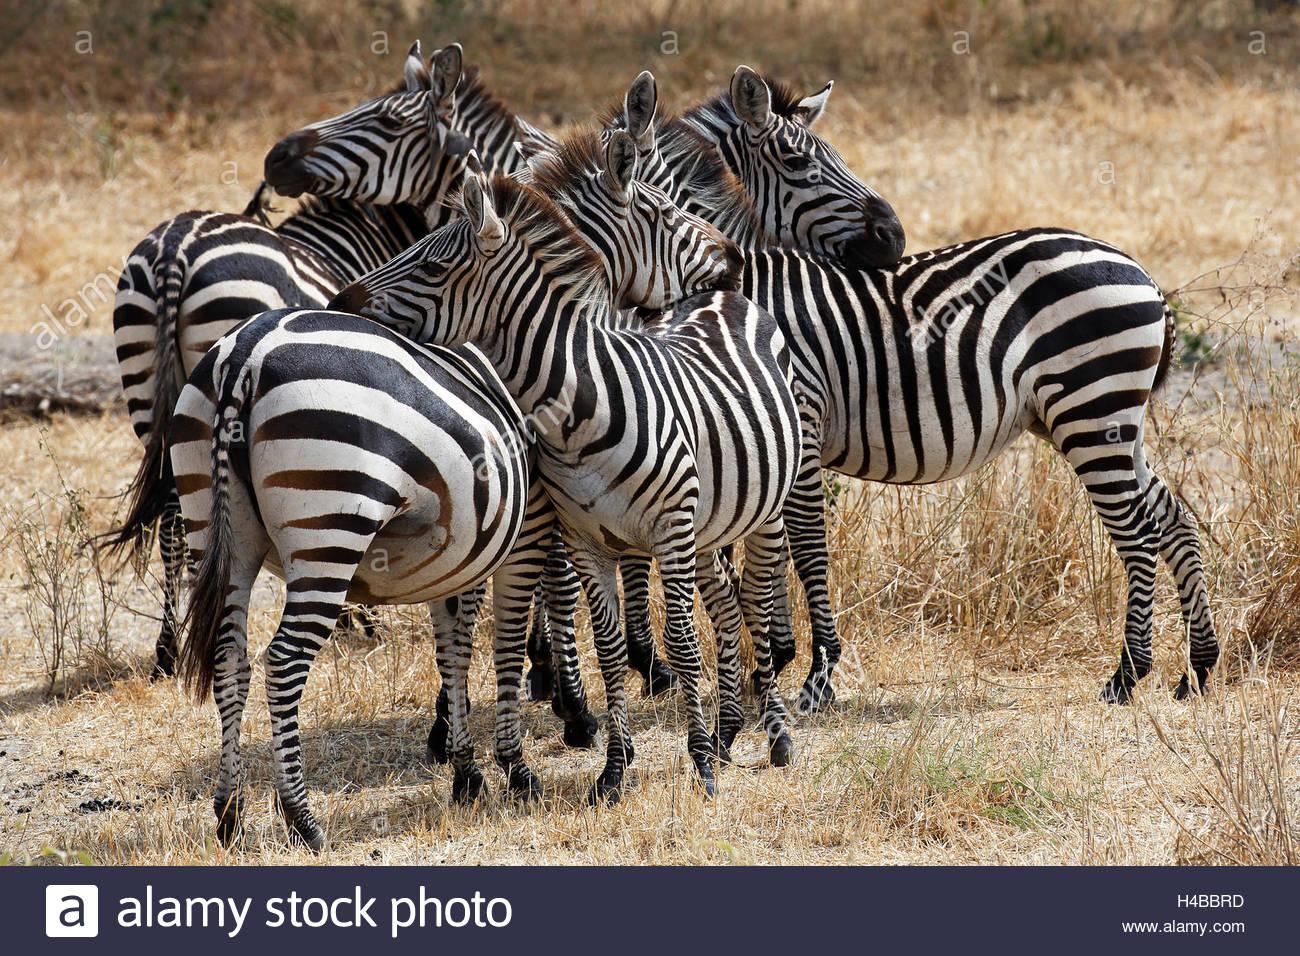 Zebra group (Equus quagga) grooming each other, Tarangire National Park, Tanzania - Stock Image